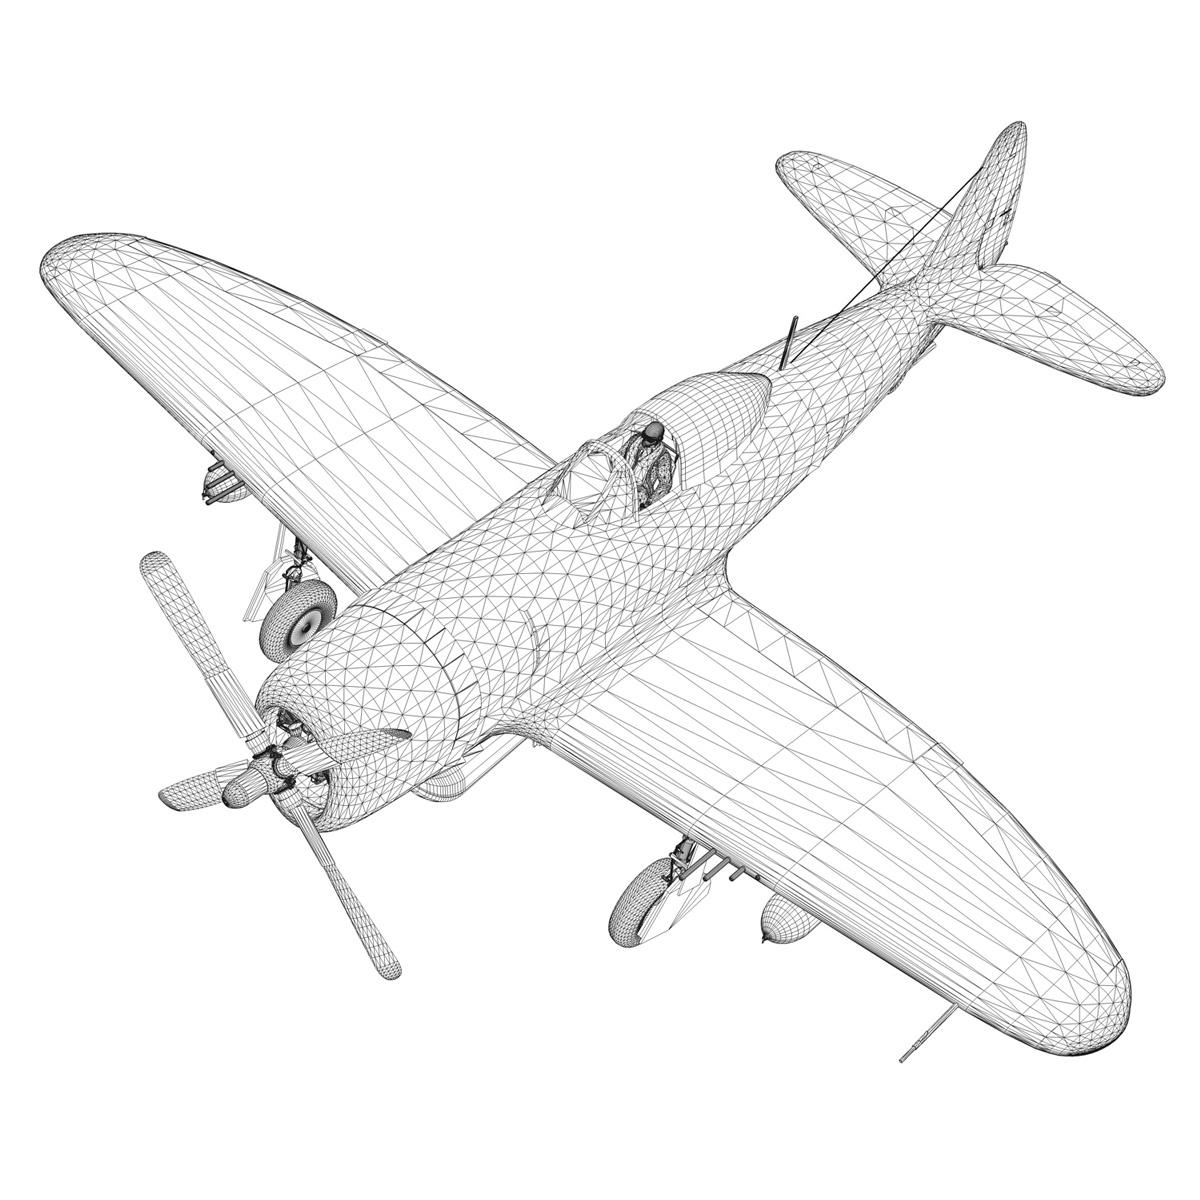 republic p-47d thunderbolt – little bunny 3d model fbx c4d lwo obj 274240